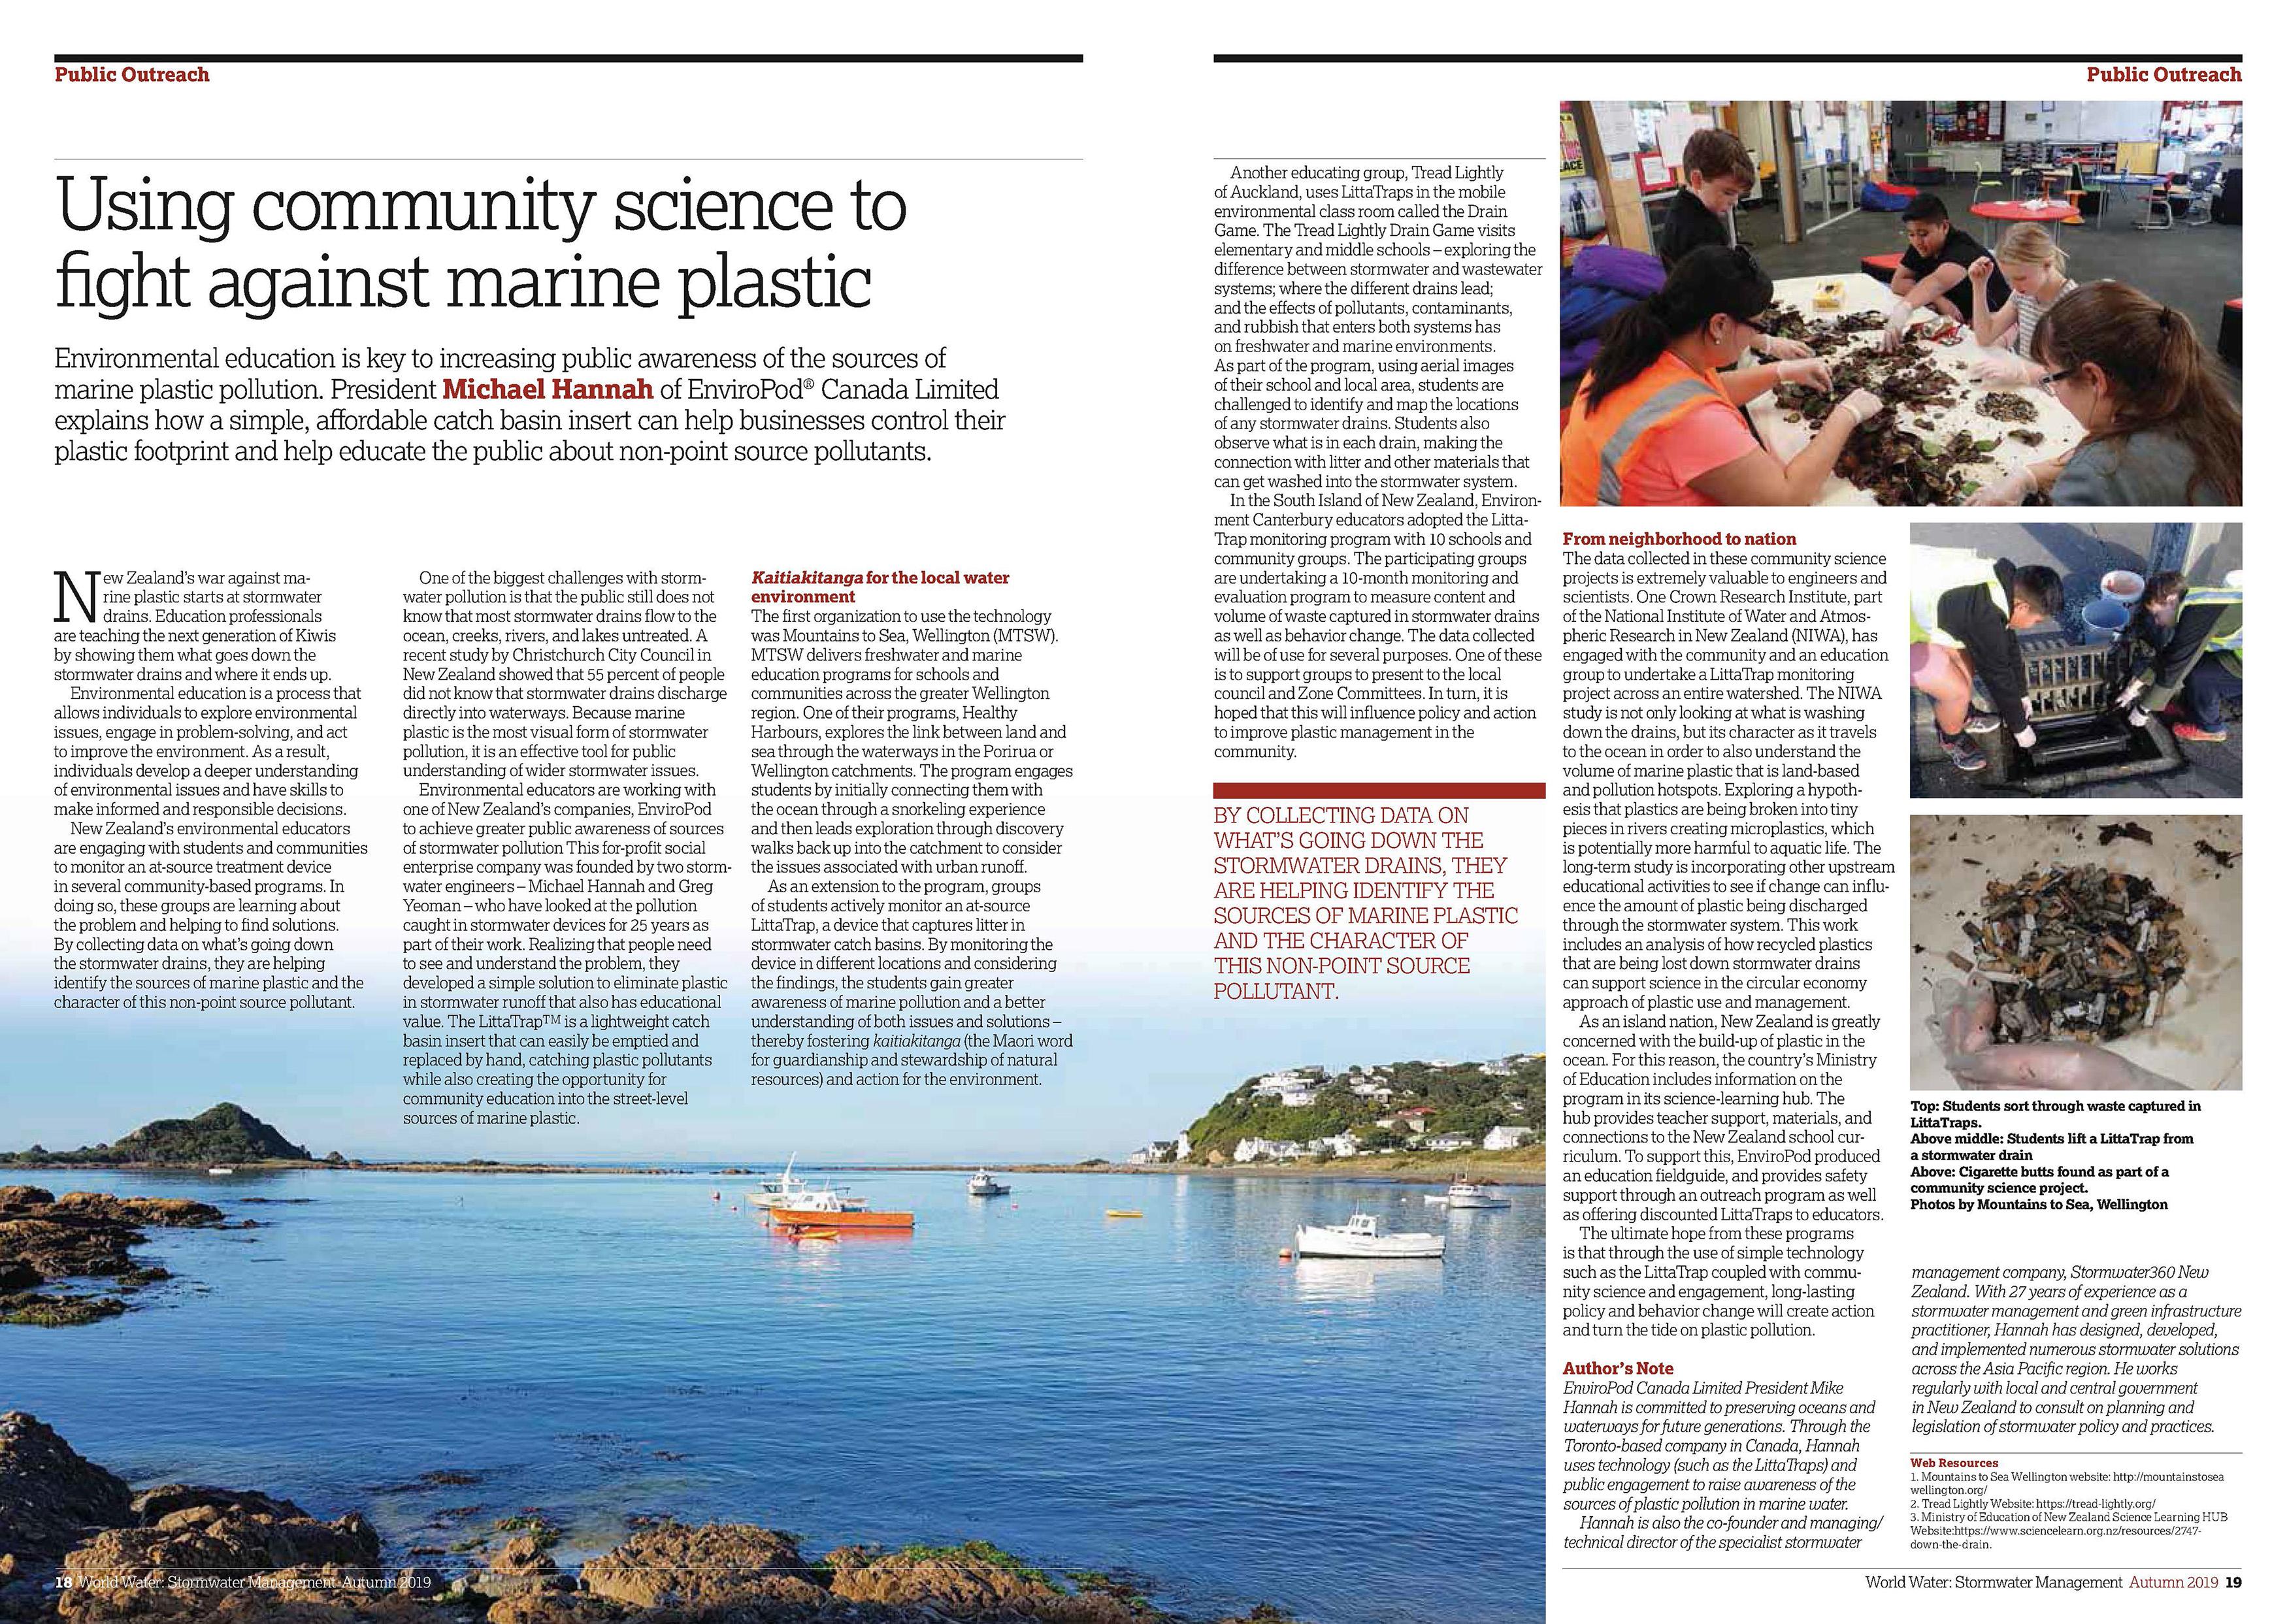 Using Community Science to Fight Marine Plastic